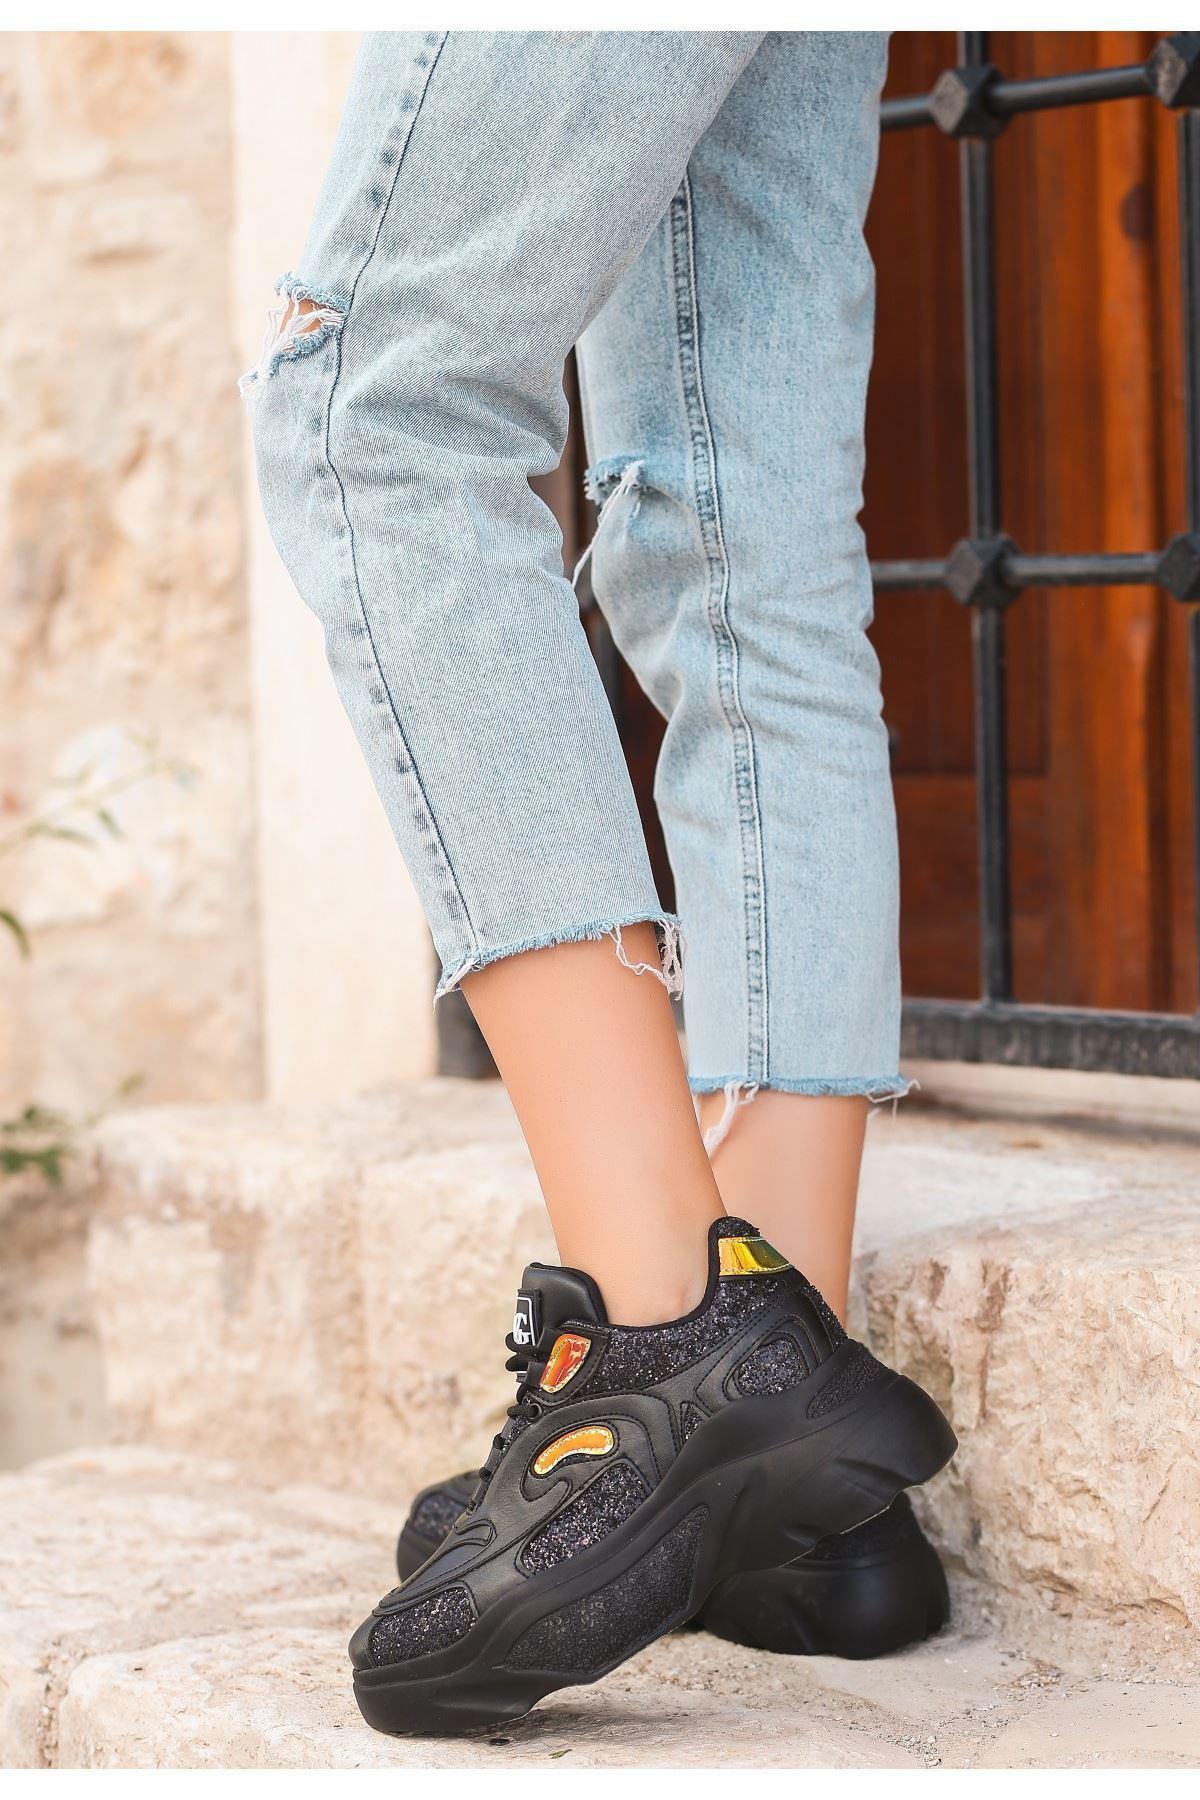 Mliy Siyah Cilt Hologramlı Spor Ayakkabı